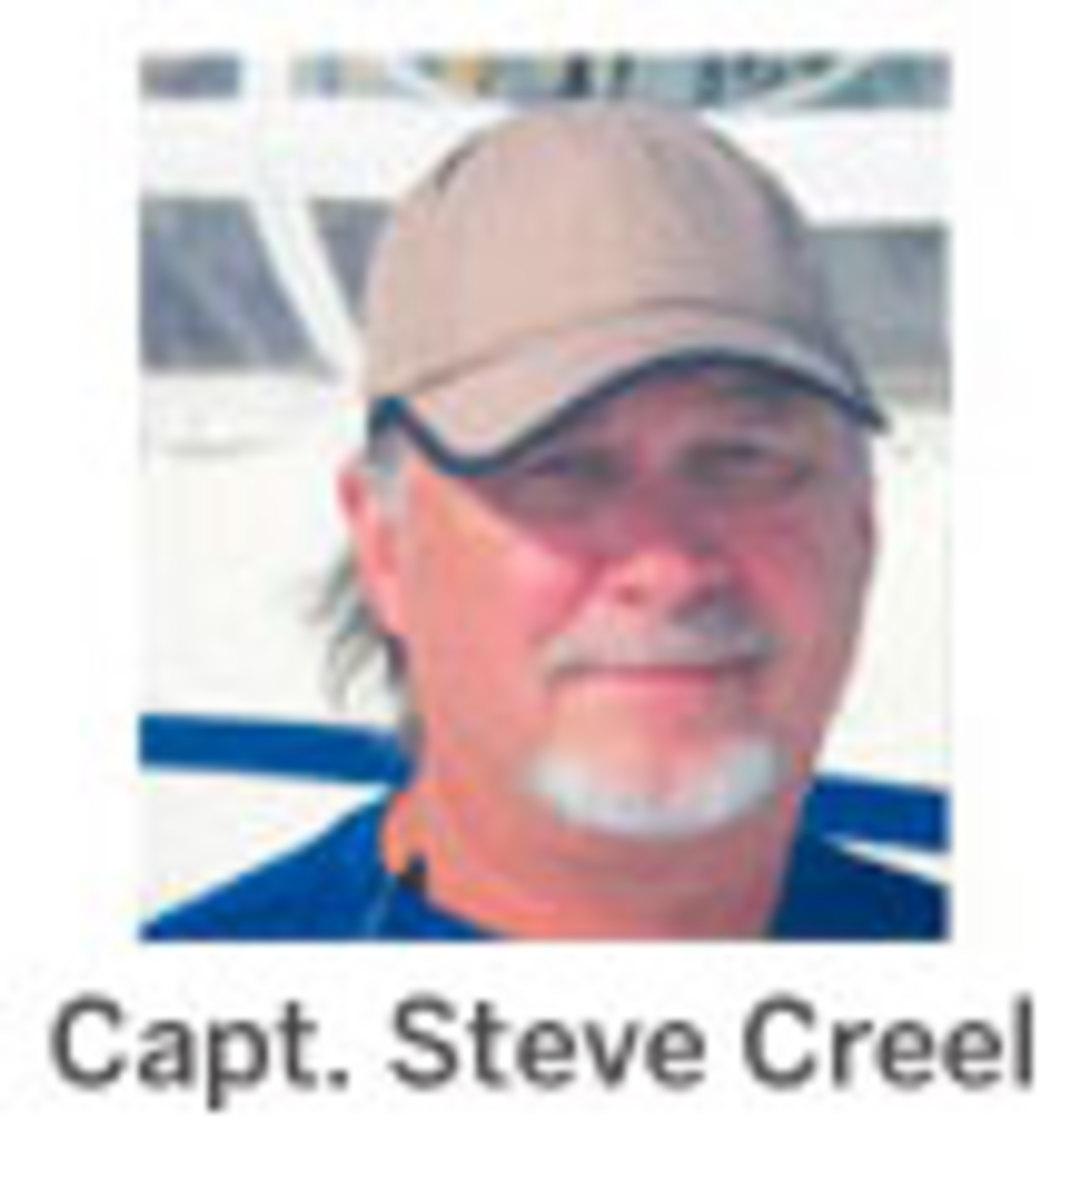 Capt. Steve Creel